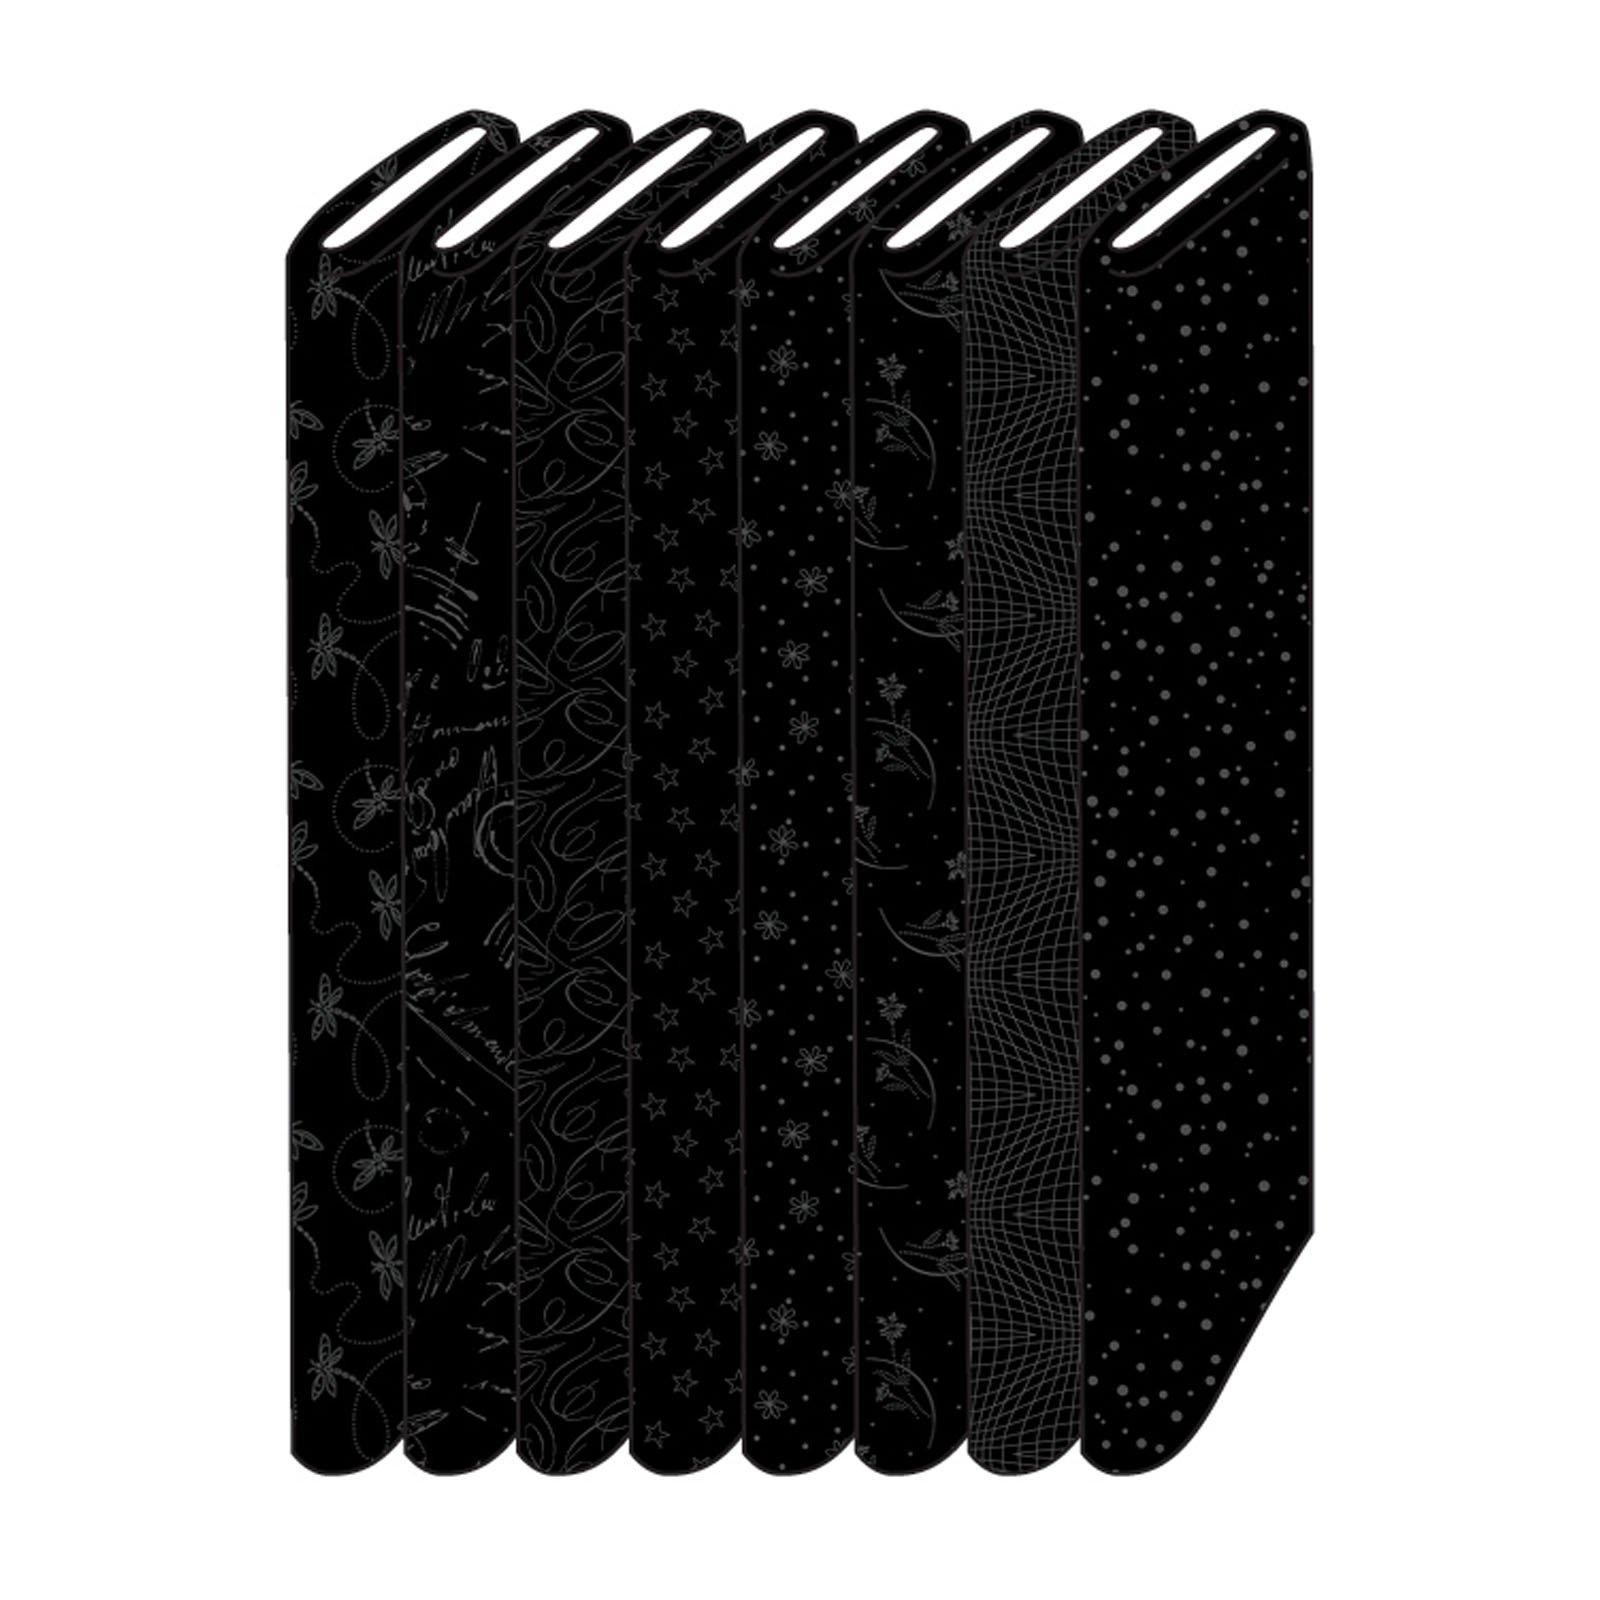 EESC-MASTHBCA - IN THE BLACK CASE ASSORTMENT 10YDS/BOLT X 8PCS